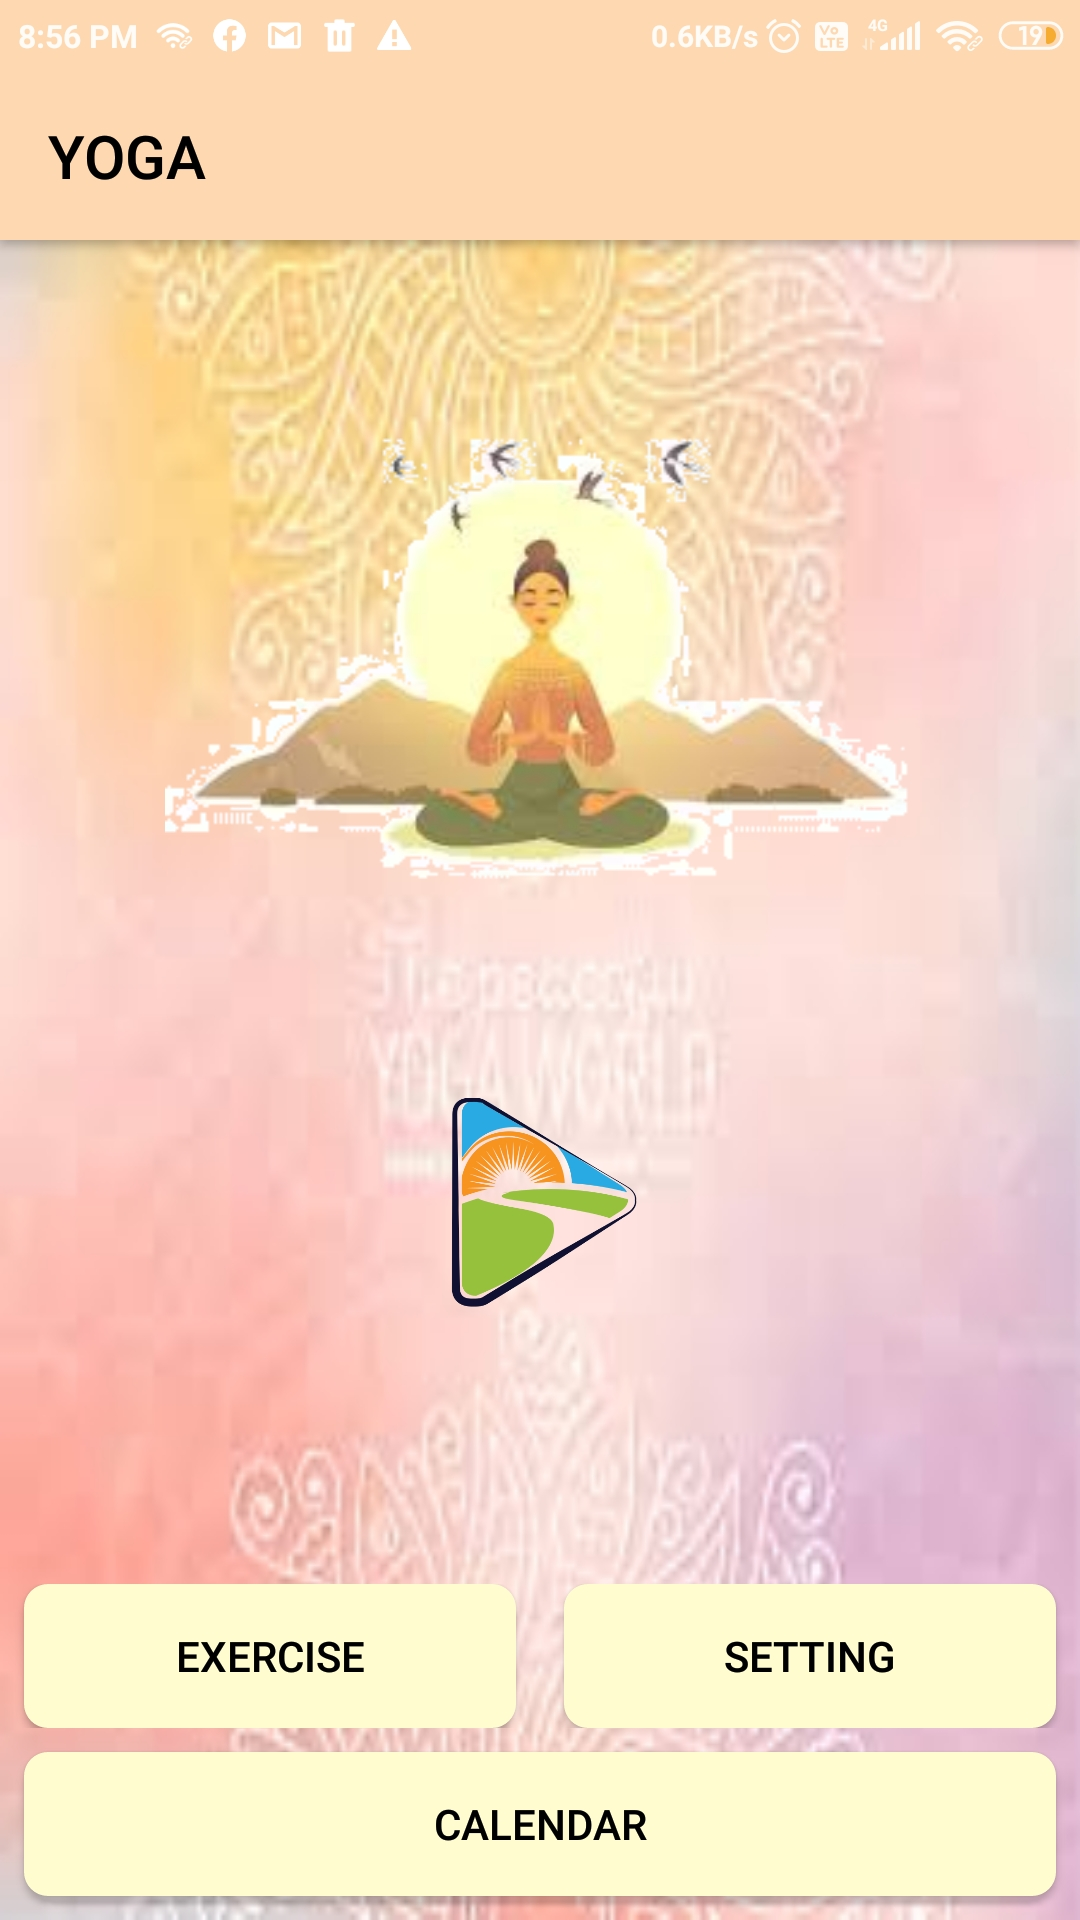 Yoga - Fitness & Health